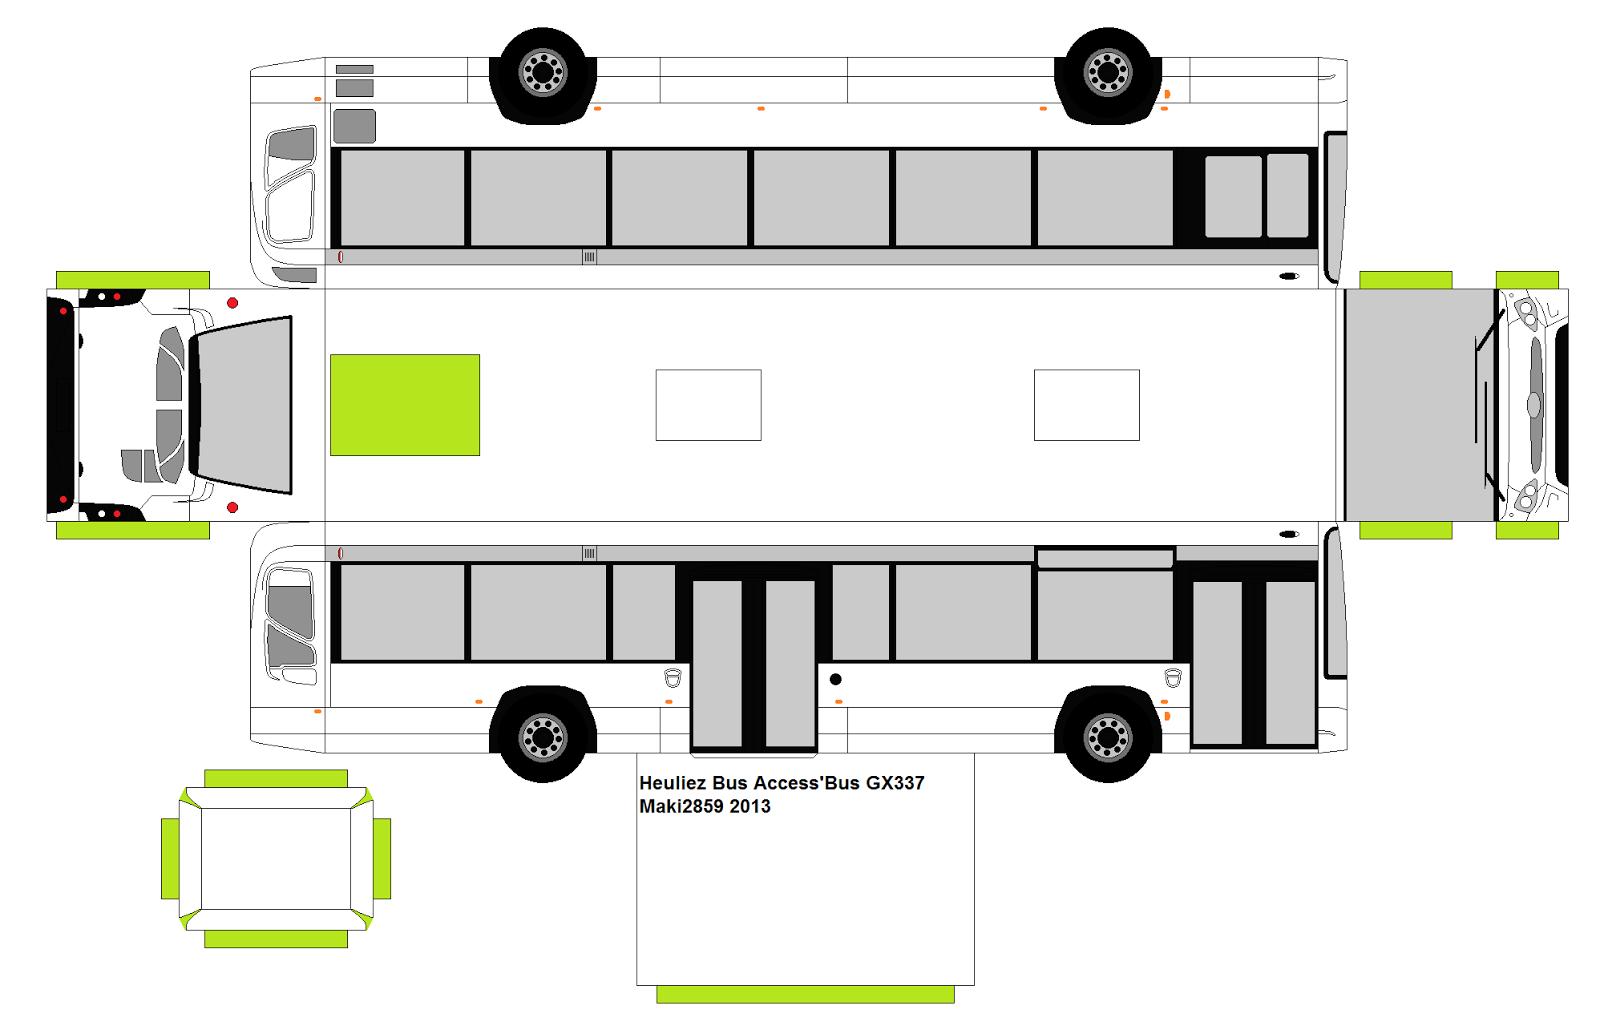 Papercraft Bus By Maki2859 Heuliez Bus Gx337 6